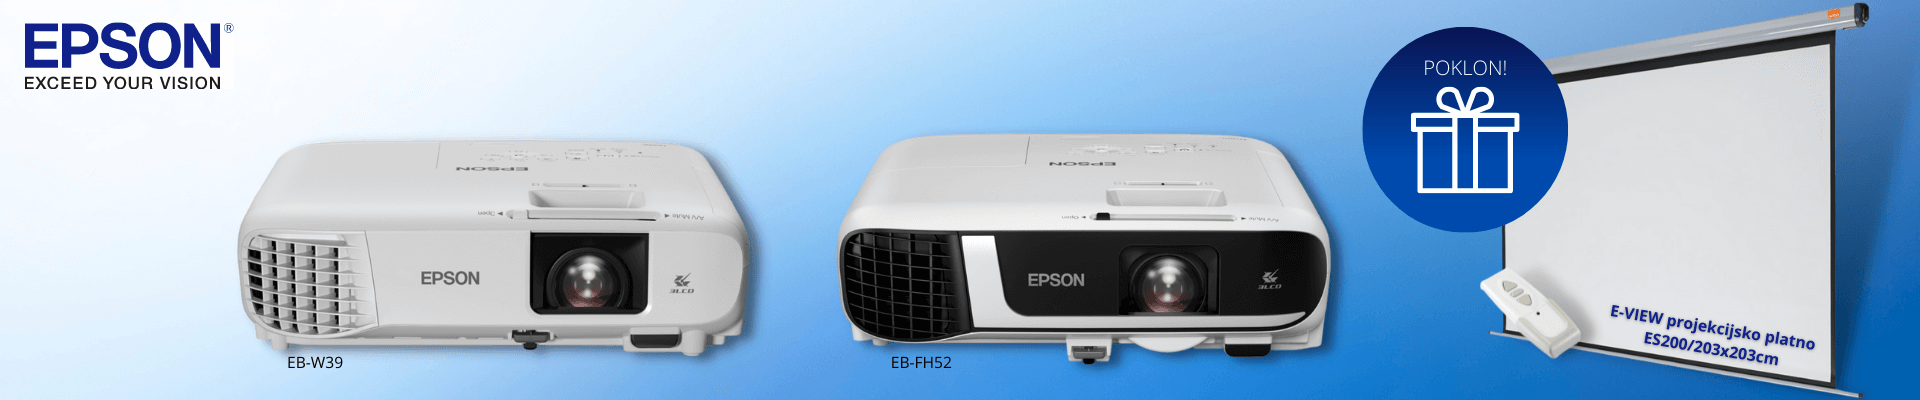 alles-epson-projektor-epsonprojektor-projekcijskoplatno